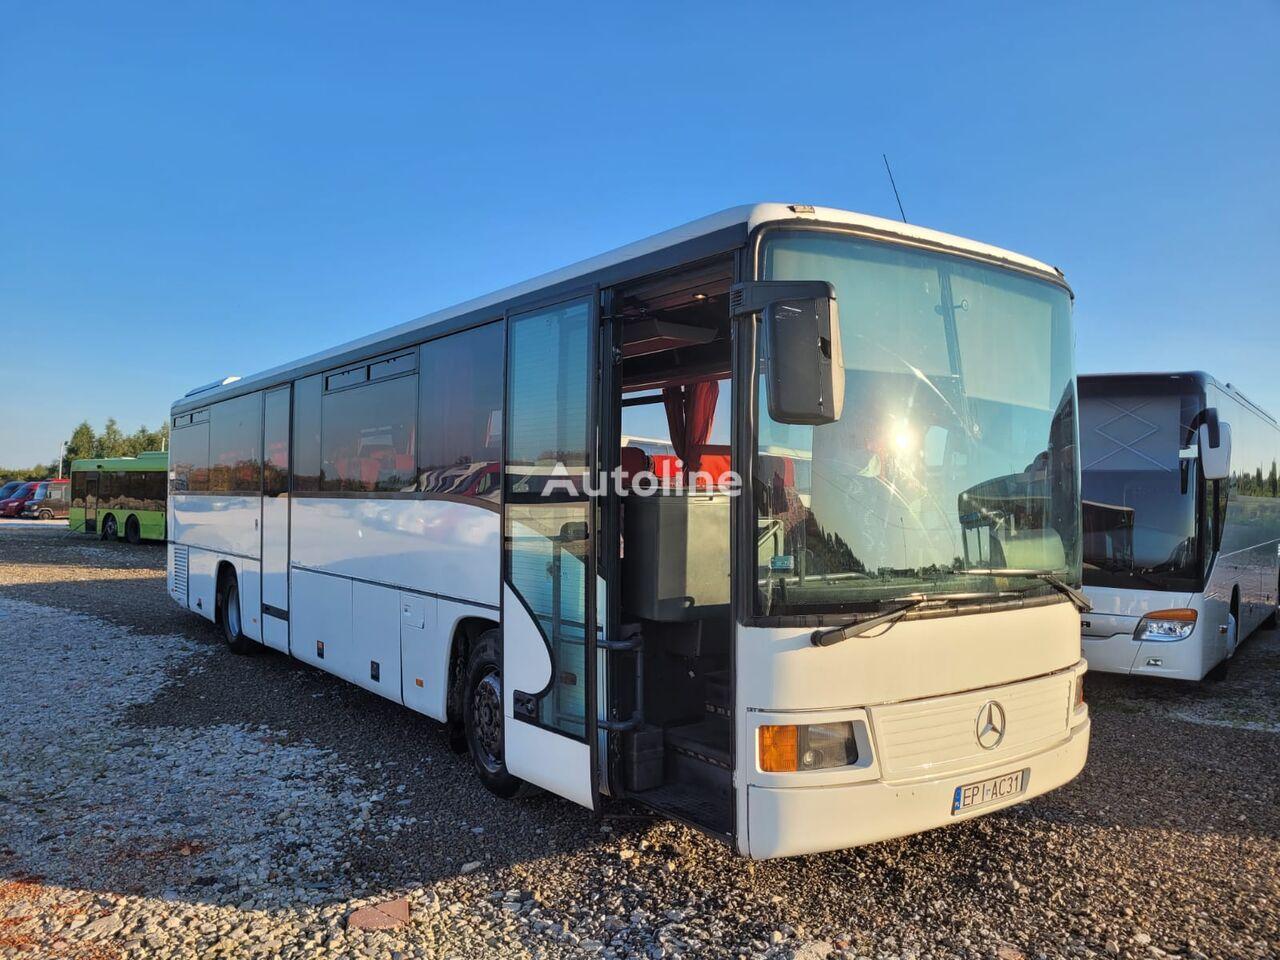 междугородний-пригородный автобус MERCEDES-BENZ O 550 Connecto